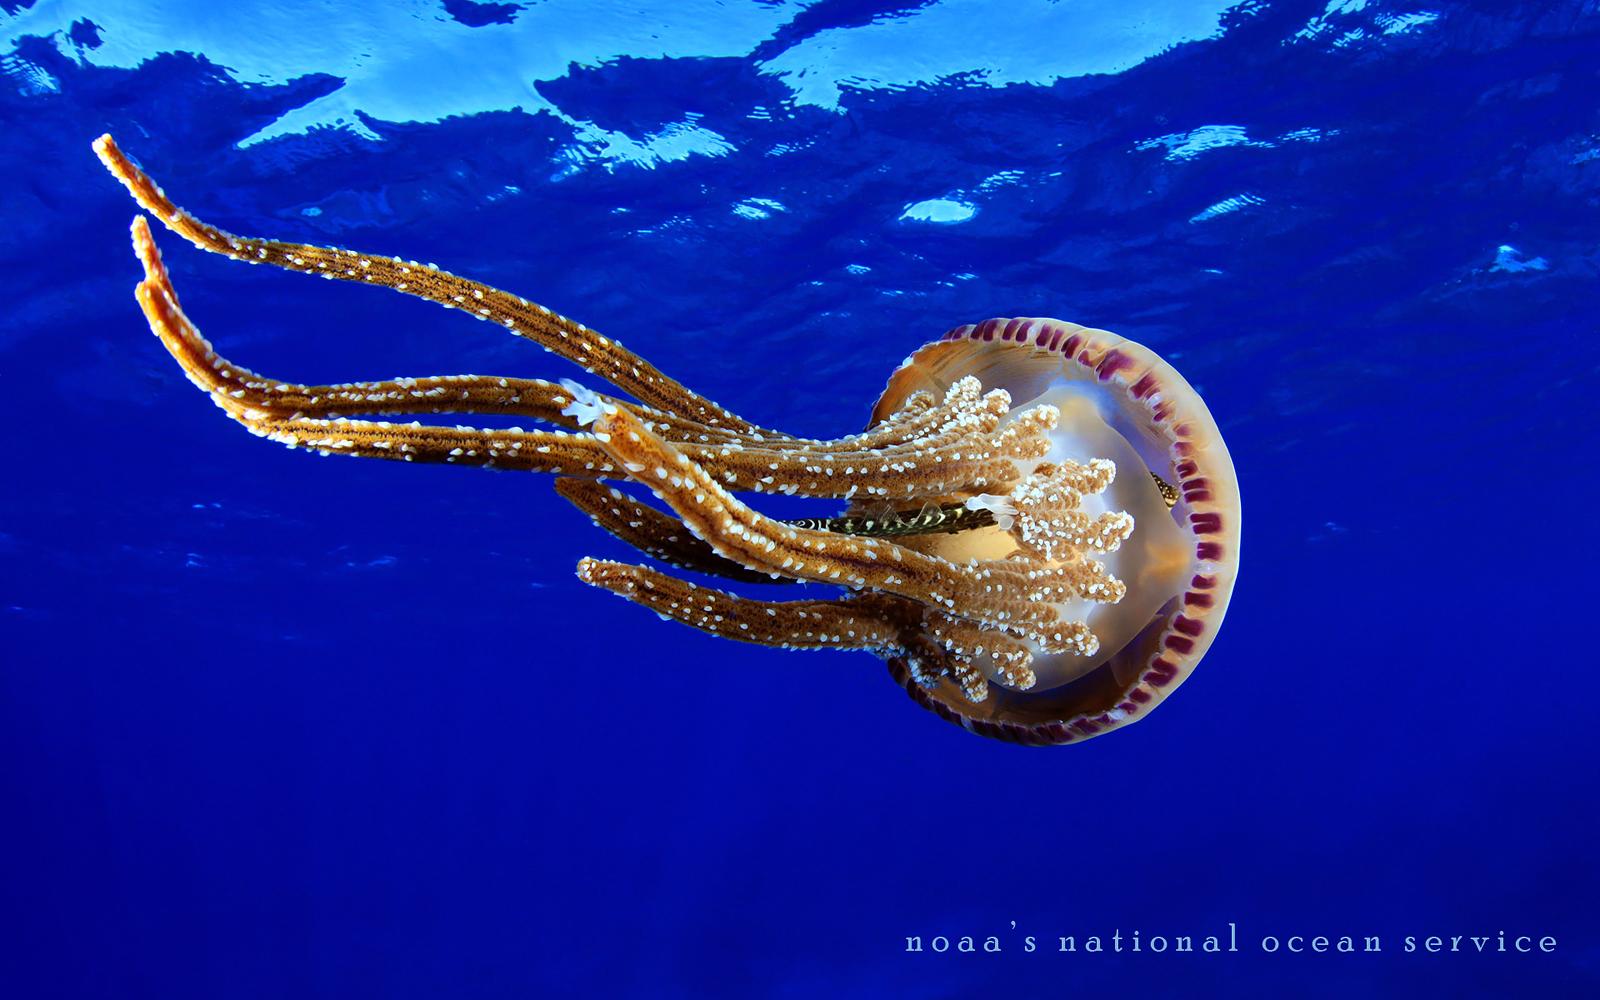 Marine Biology Wallpaper - WallpaperSafari Водоросли Png